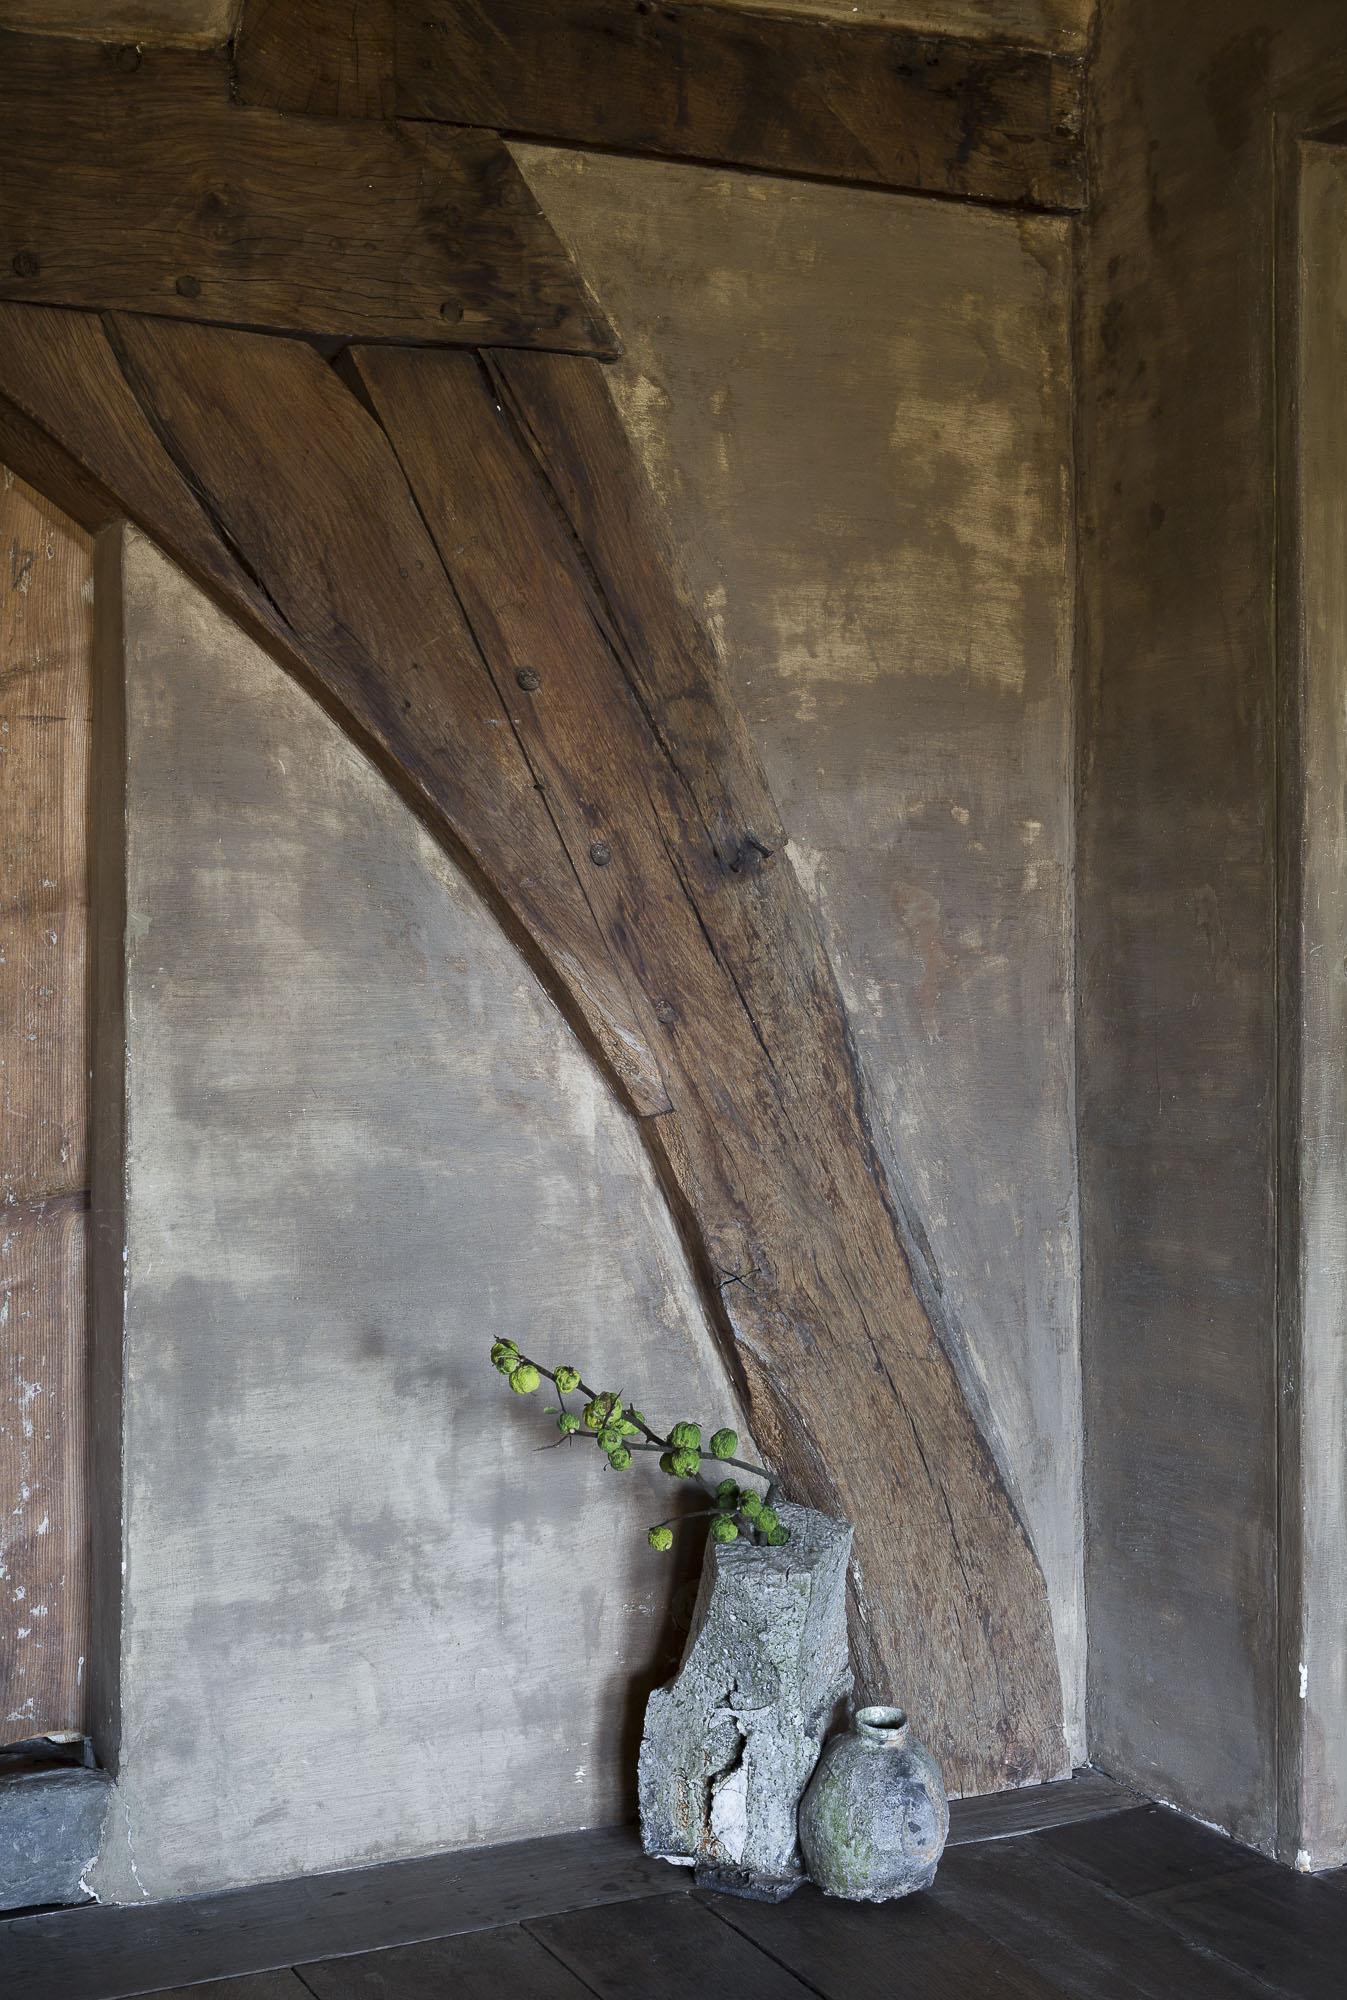 art-dealer-axel-vervoordt-belgian-estate-by-frederik-vercruysse-4